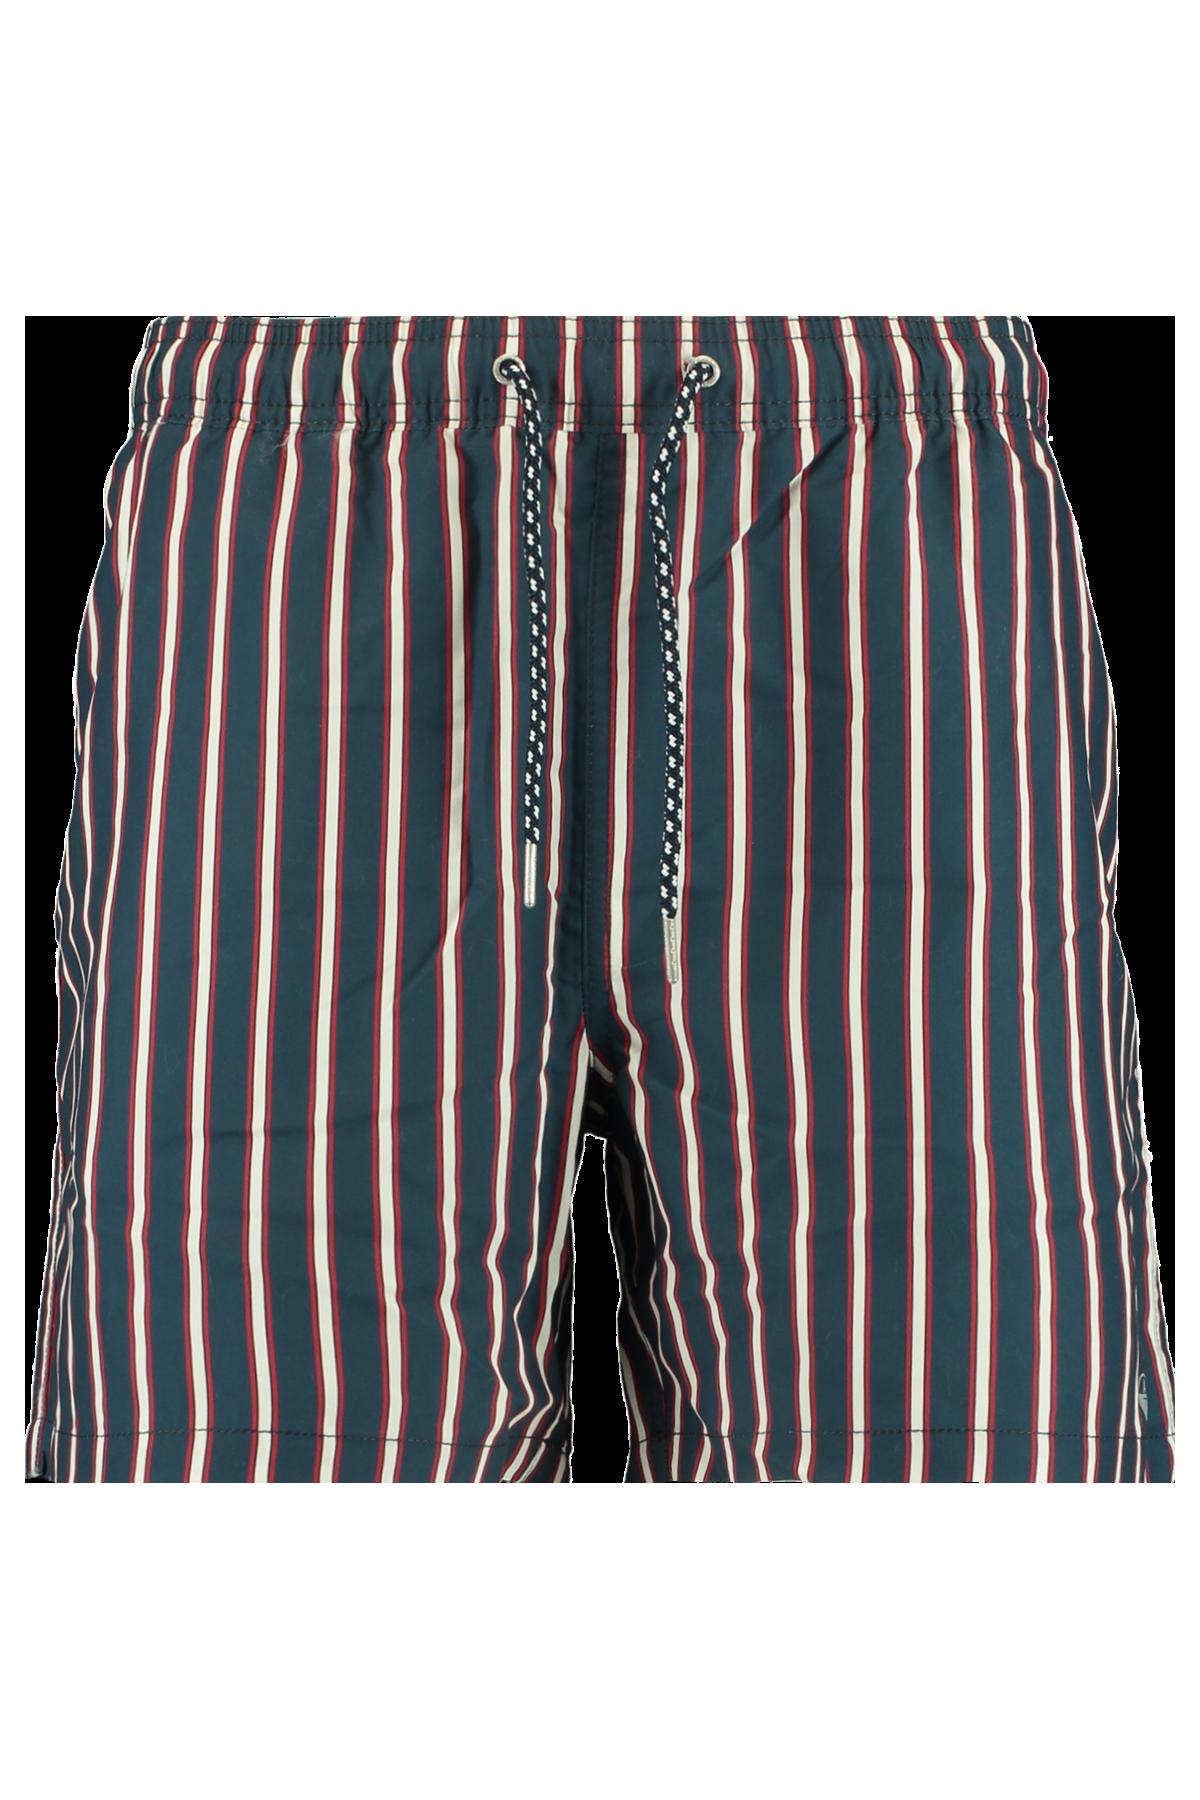 Badehose Arizona Stripe